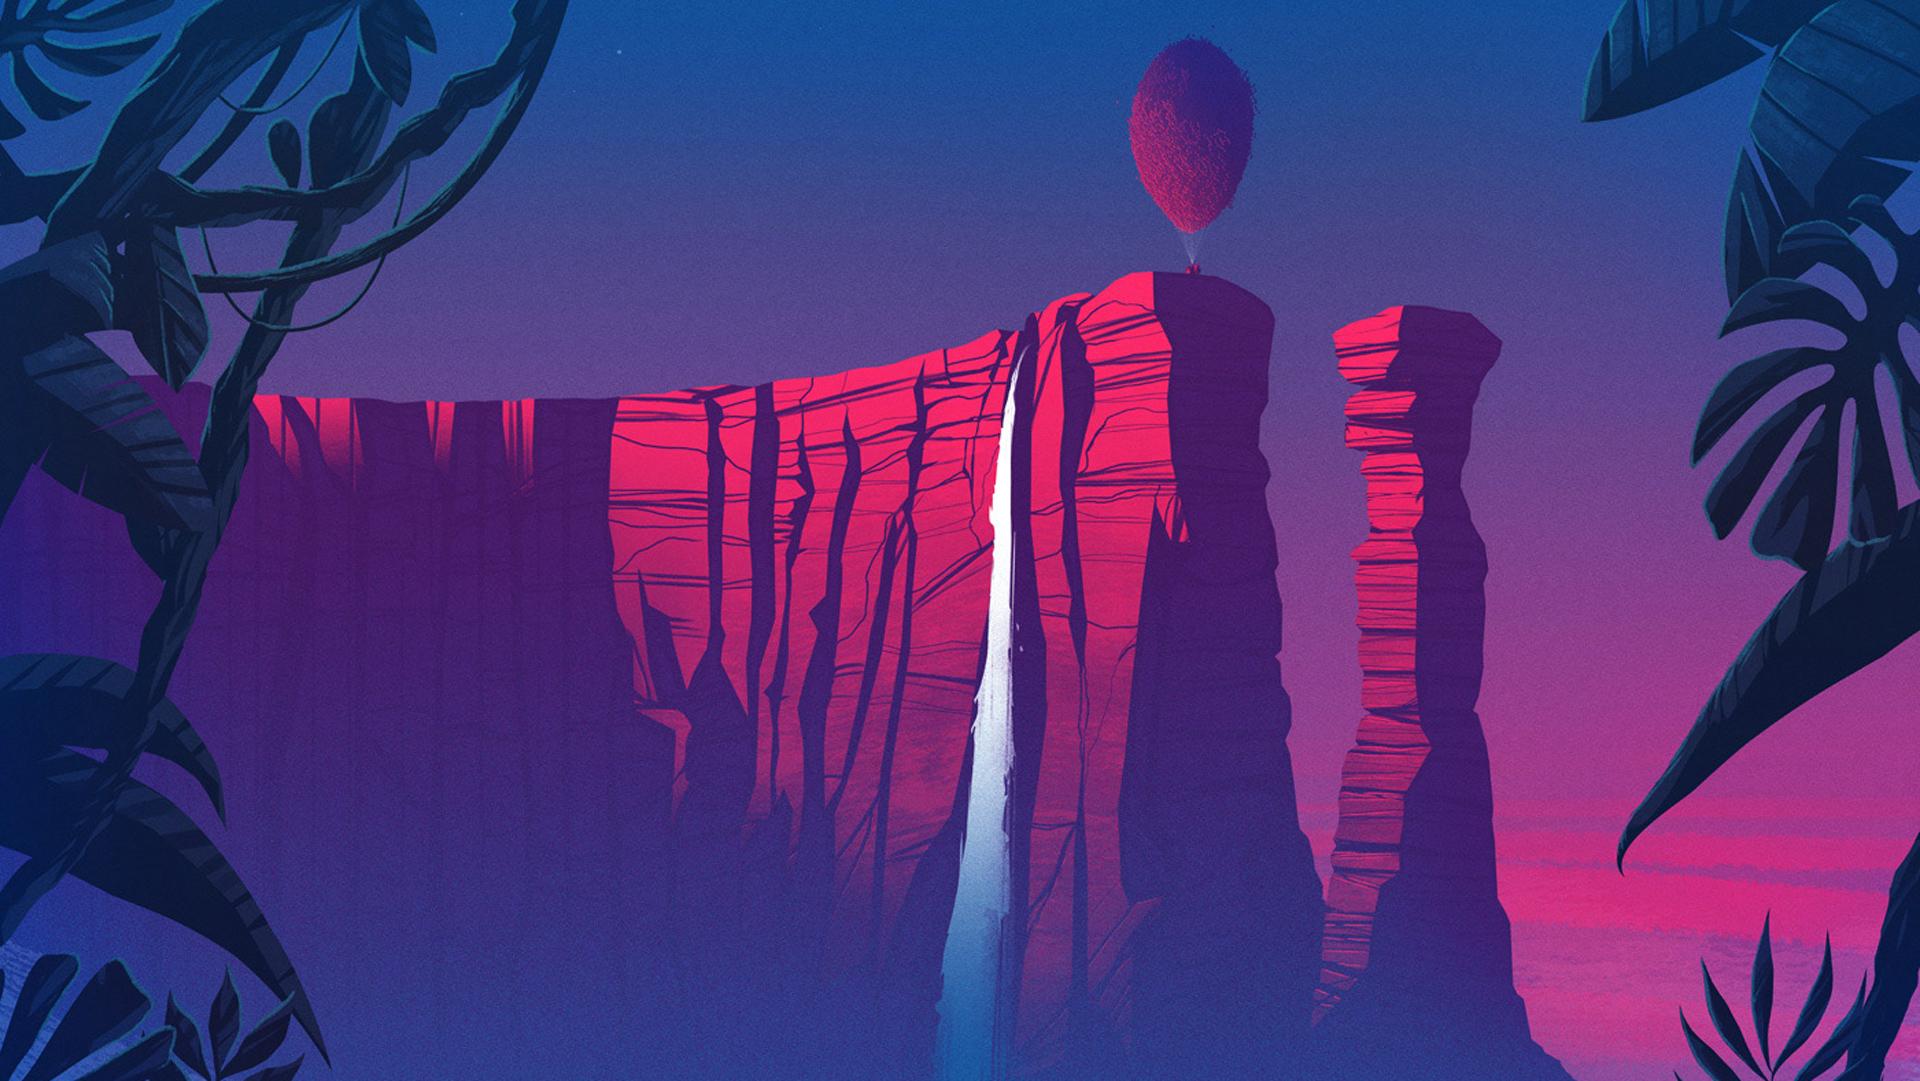 Up Movie Digital Art Hd Artist 4k Wallpapers Images Backgrounds